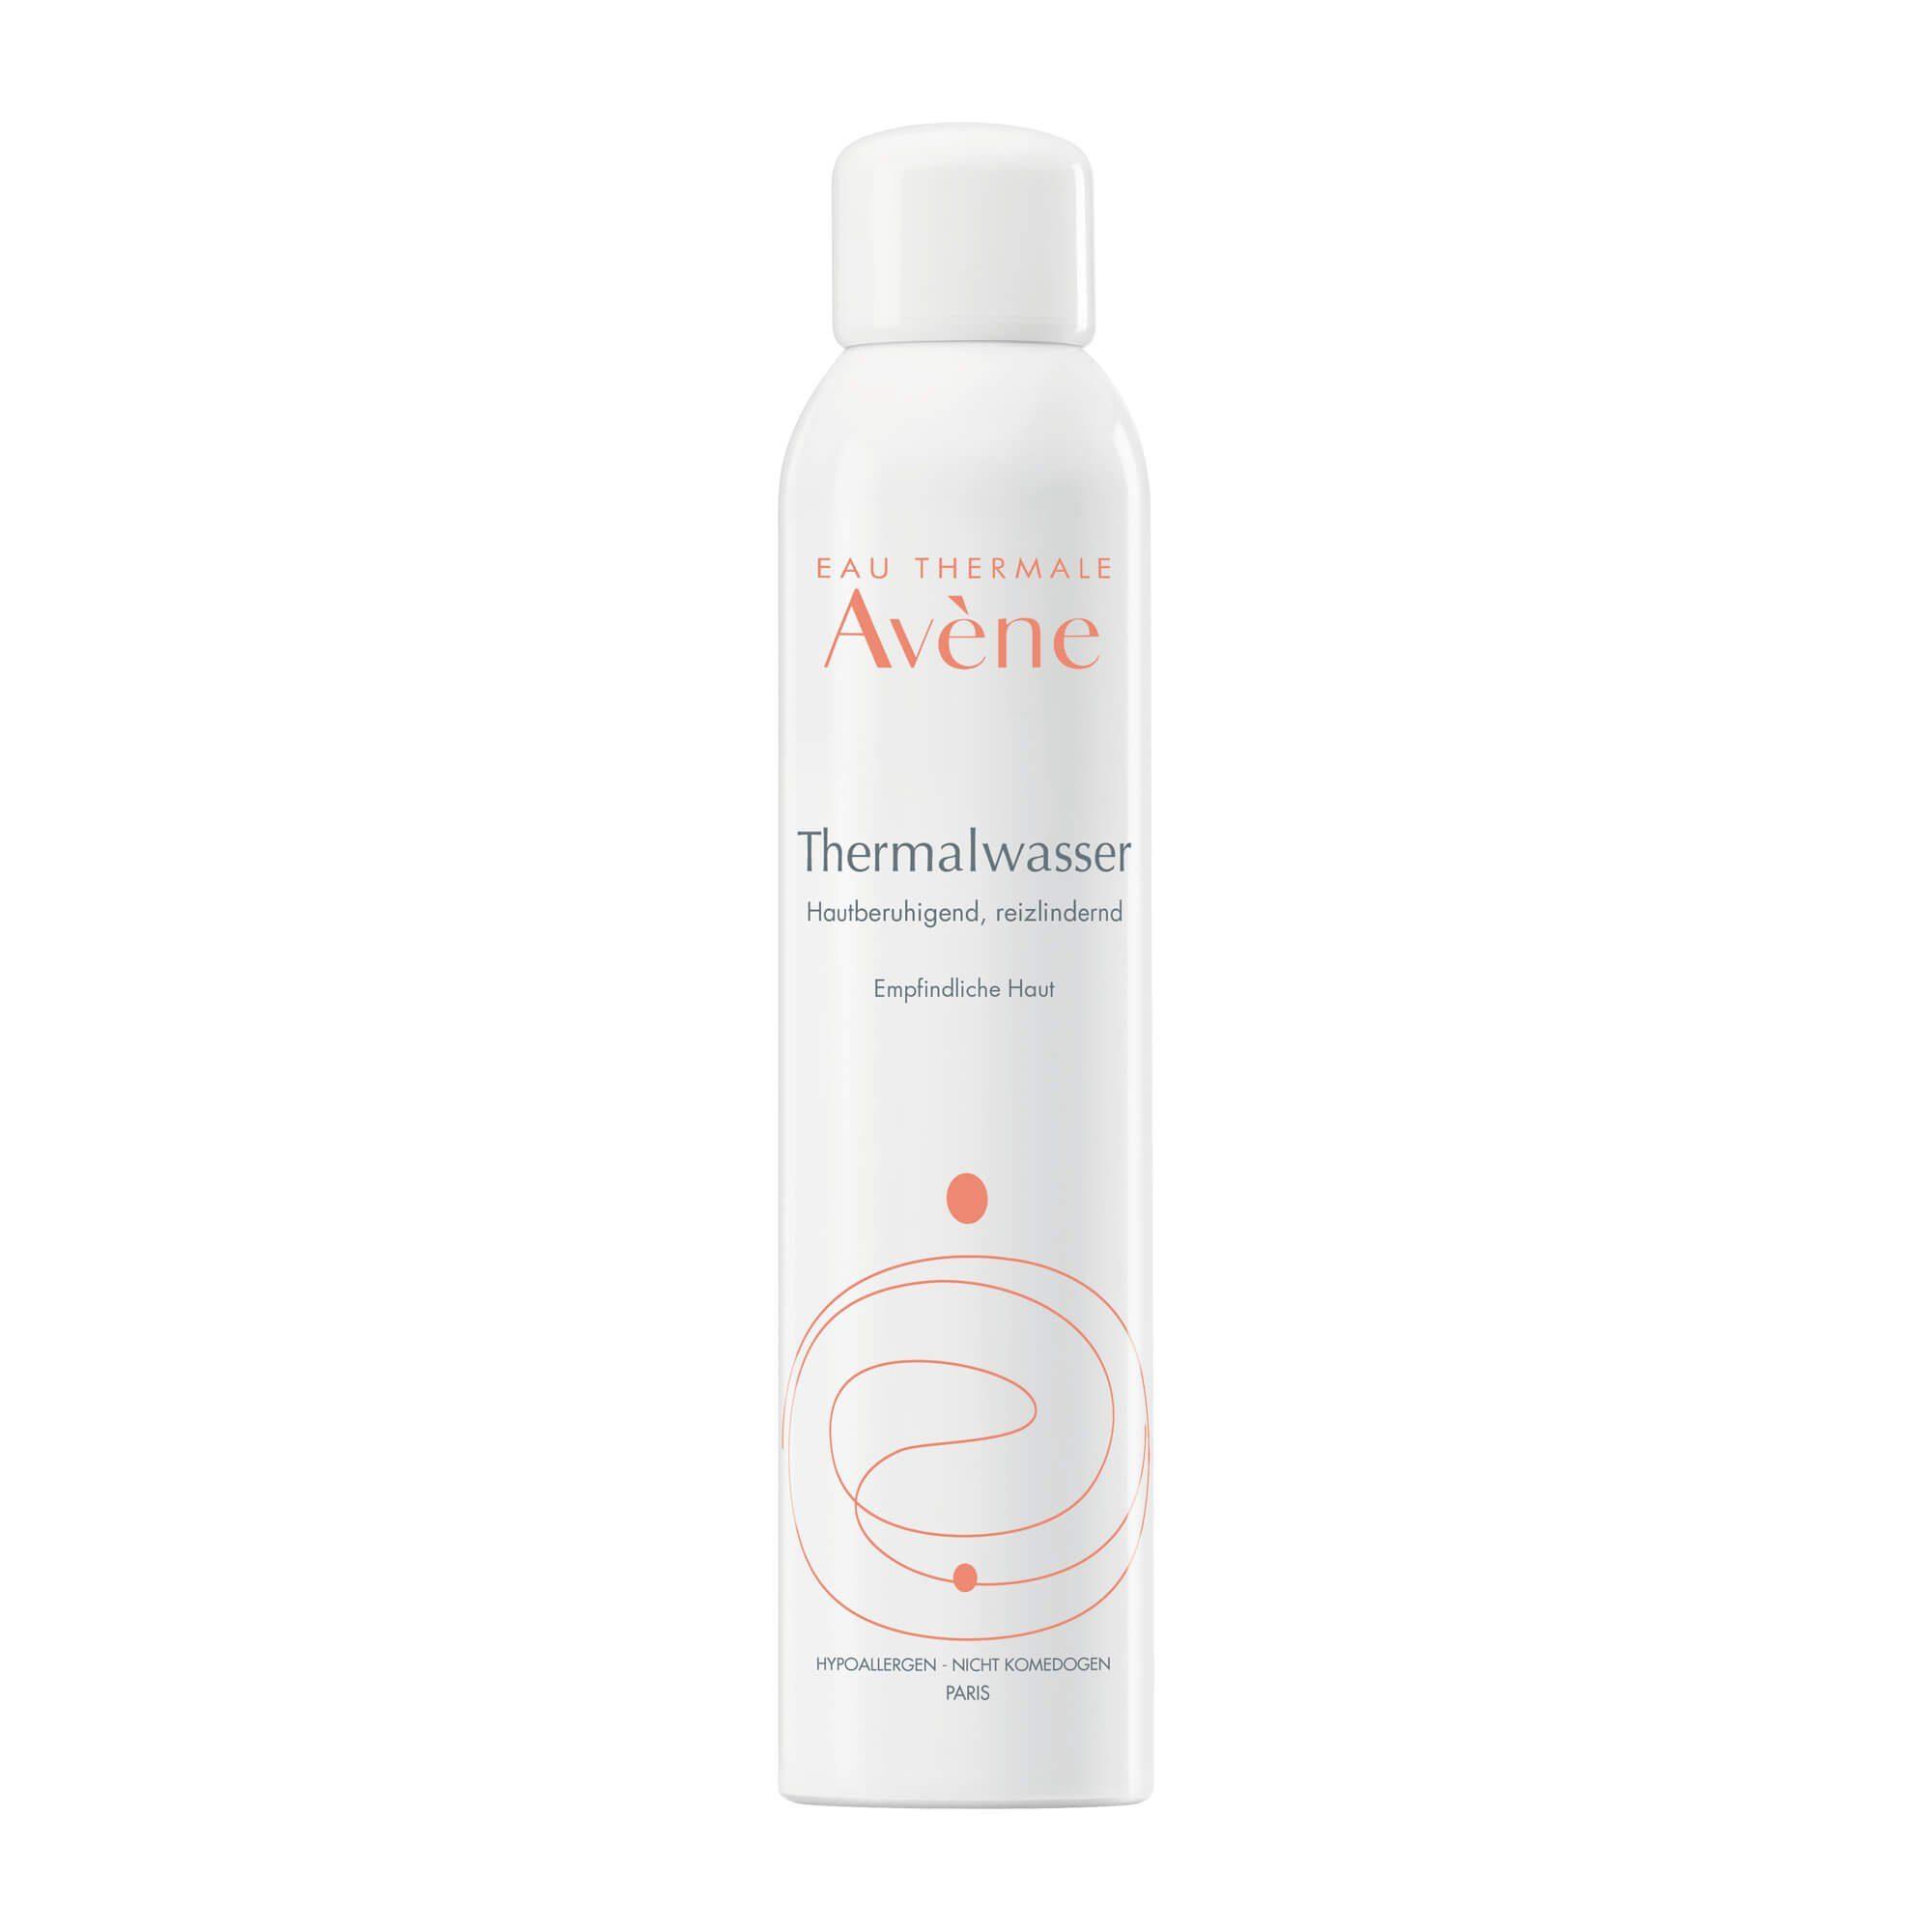 Avene Avene Thermalwasser Spray, 300 ml